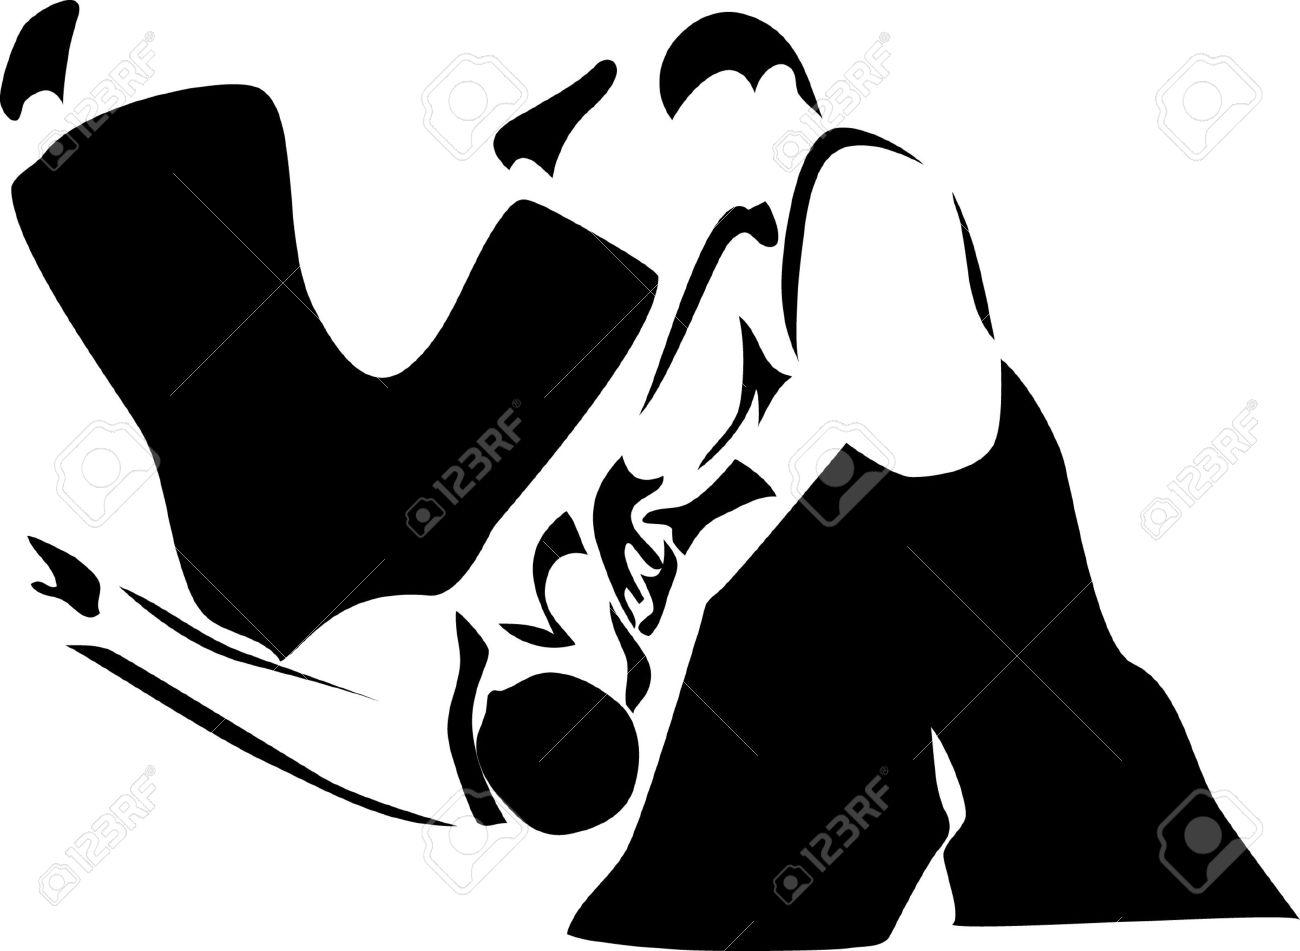 ♕ SPIRIT BRINGERS: EMPYREAN REALM. (SAGA DE UNUKALHAI) - Página 21 10771478-aikido-logo-Foto-de-archivo